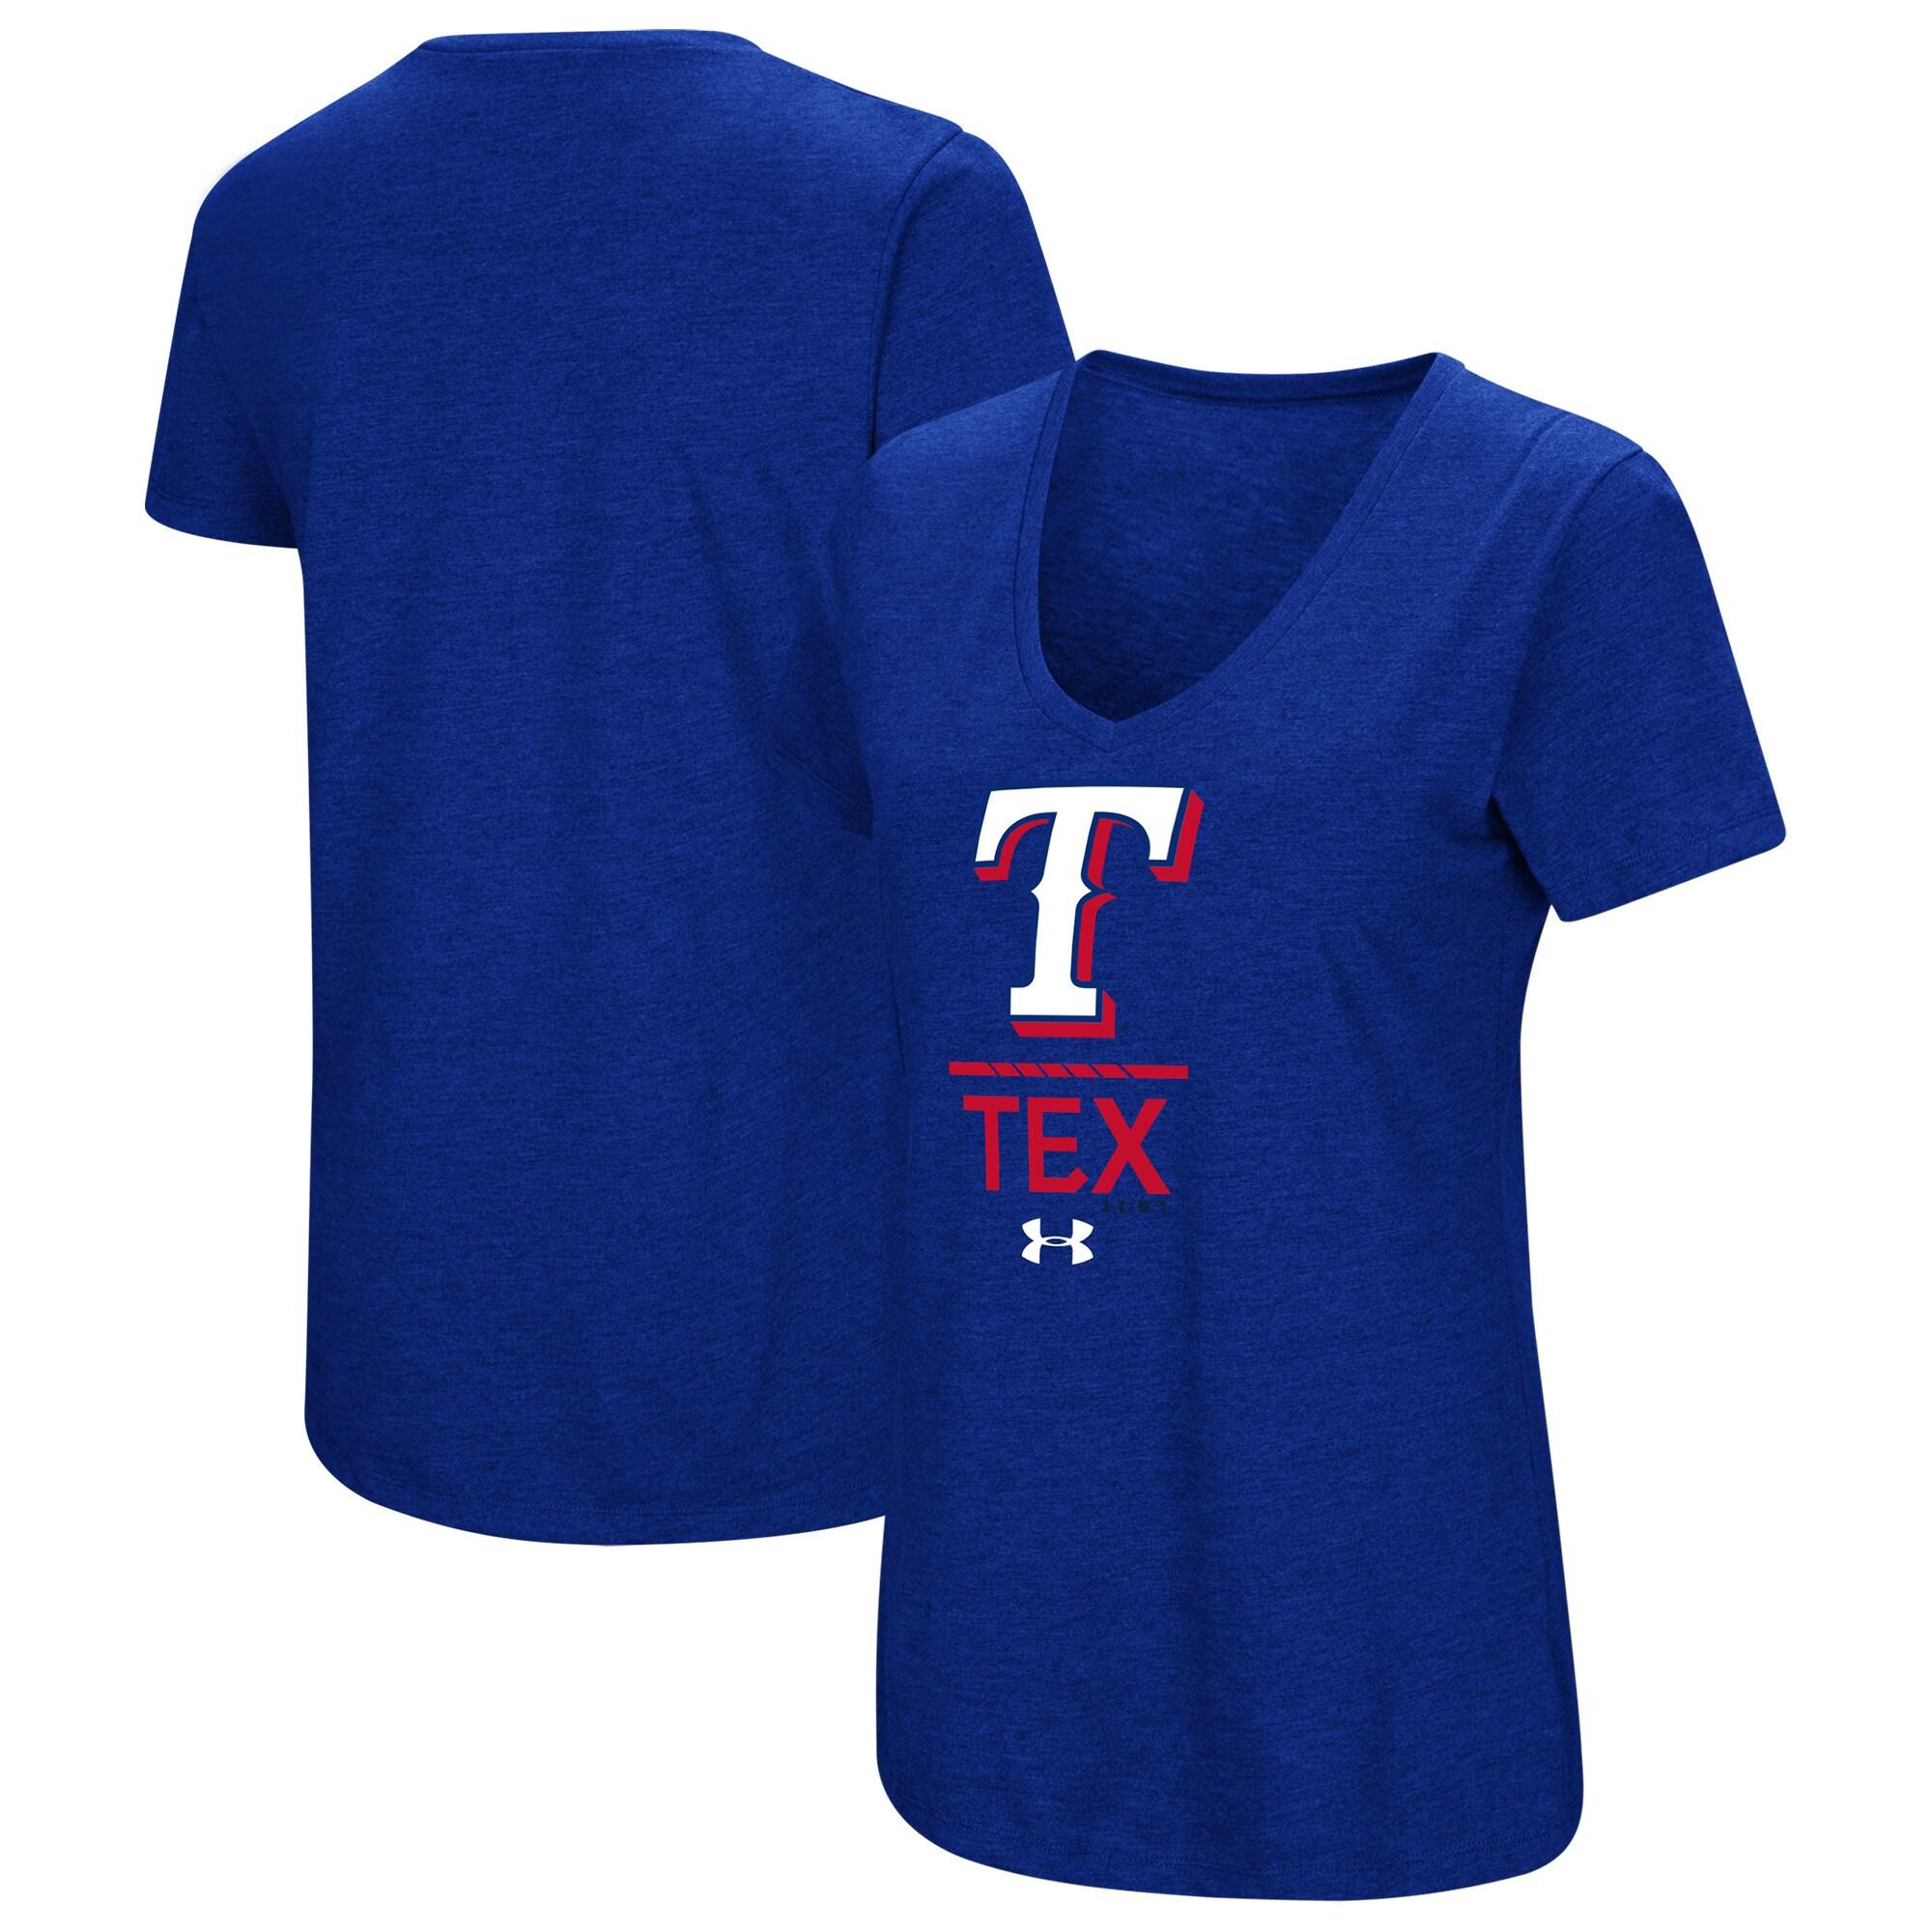 Texas Rangers Under Armour Women's Team Lock-Up Tri-Blend T-Shirt - Royal